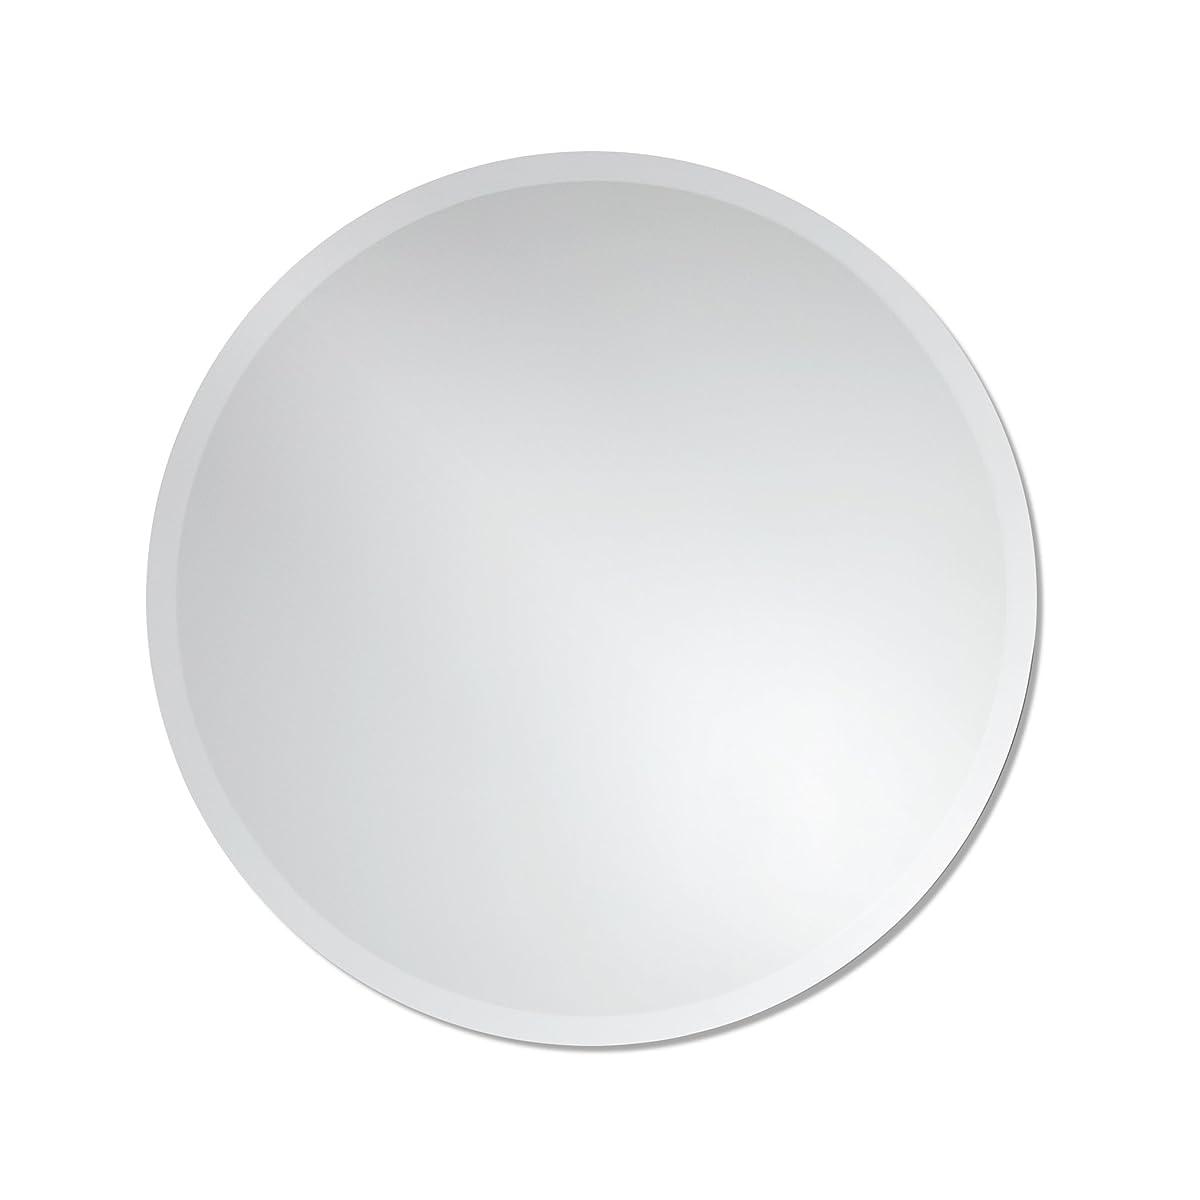 Round Frameless Wall Mirror   Bathroom, Vanity, Bedroom Mirror   28-inch Diameter Circle   Beveled Edge